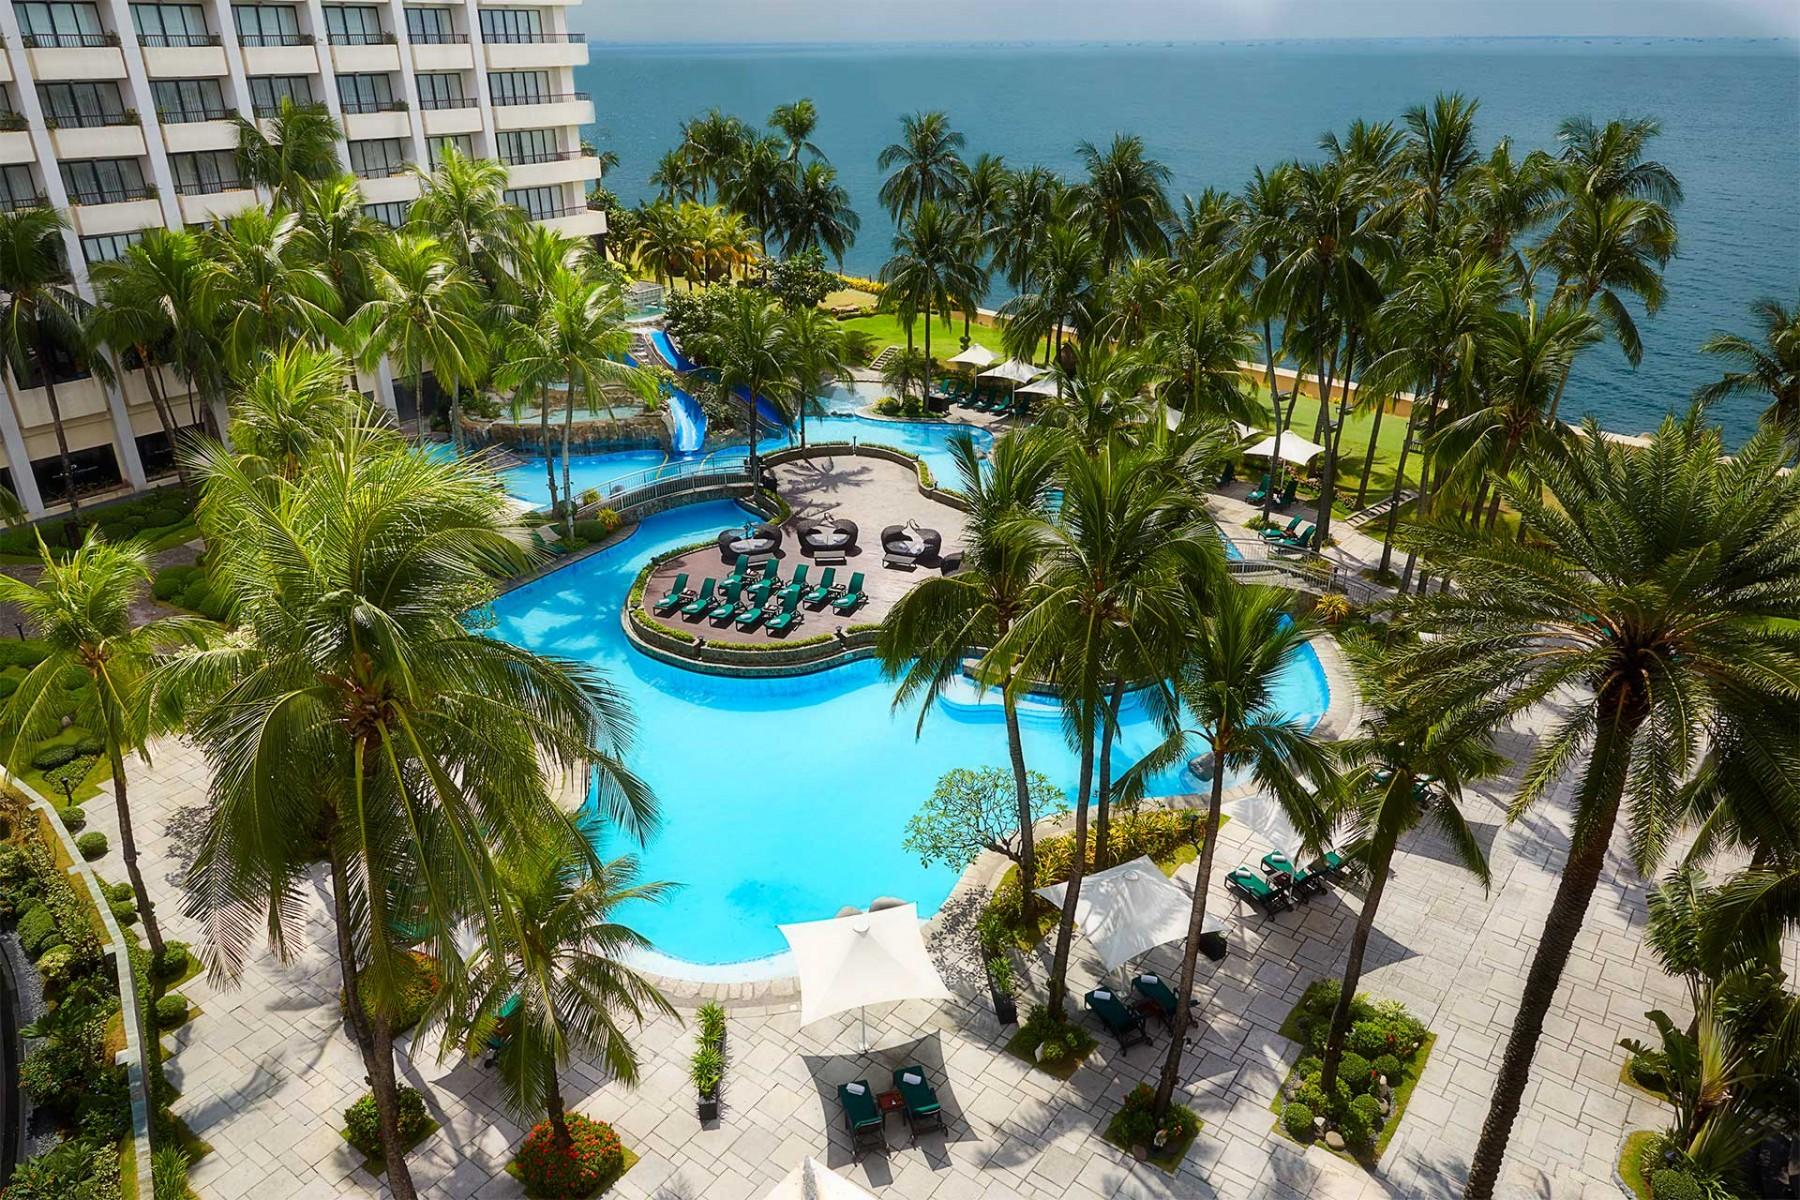 Sofitel philippine plaza manila swimming pool 1 for Cheap hotels in cebu with swimming pool